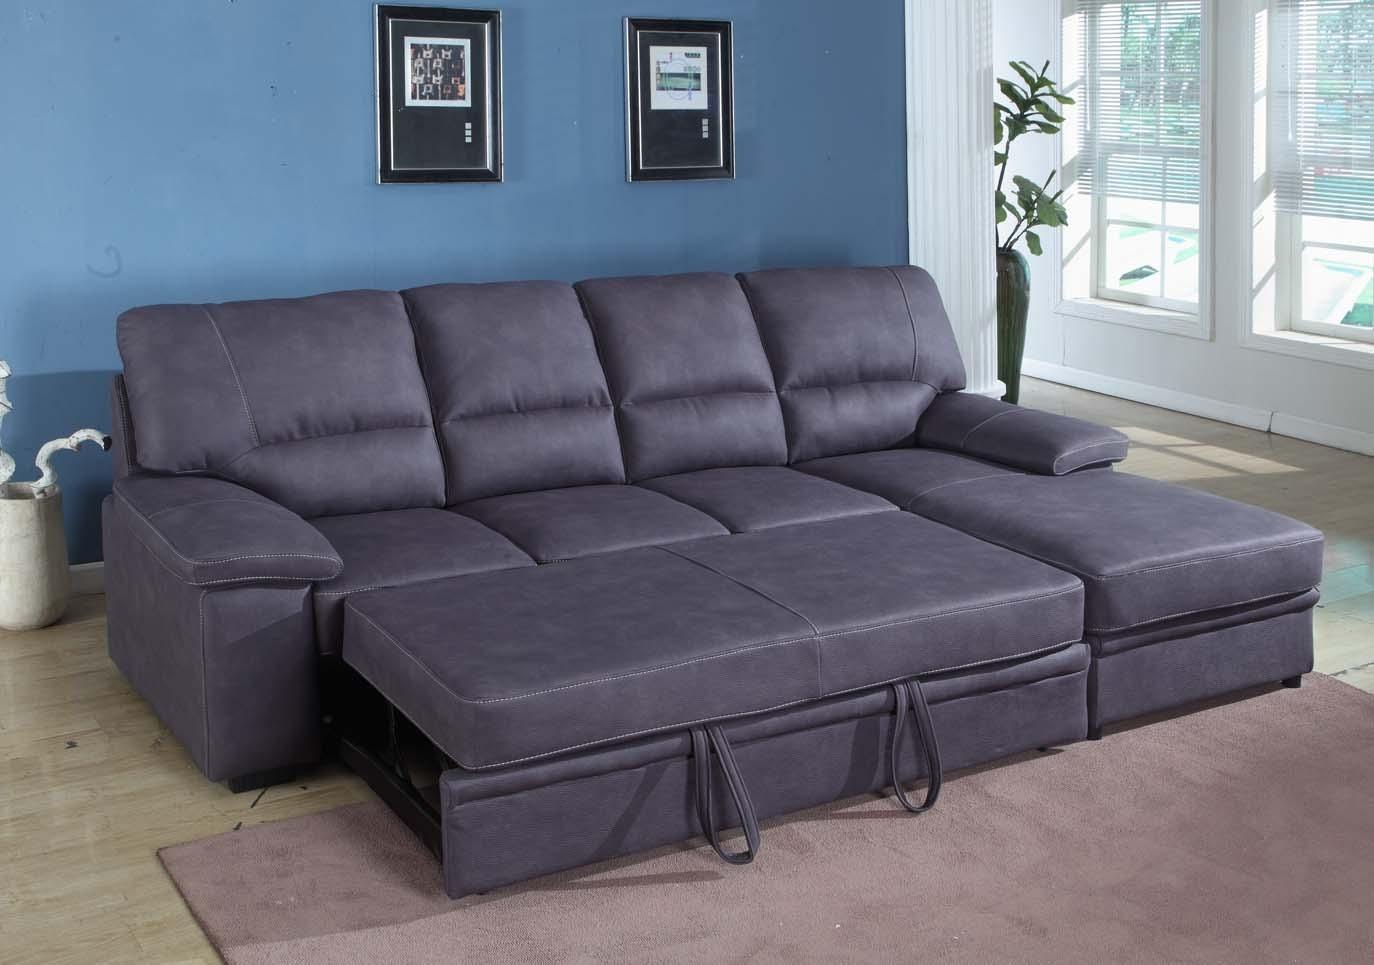 Grey Sleeper Sectional Sofa | Houston Mattress King For Houston Sectional Sofas (Image 6 of 10)